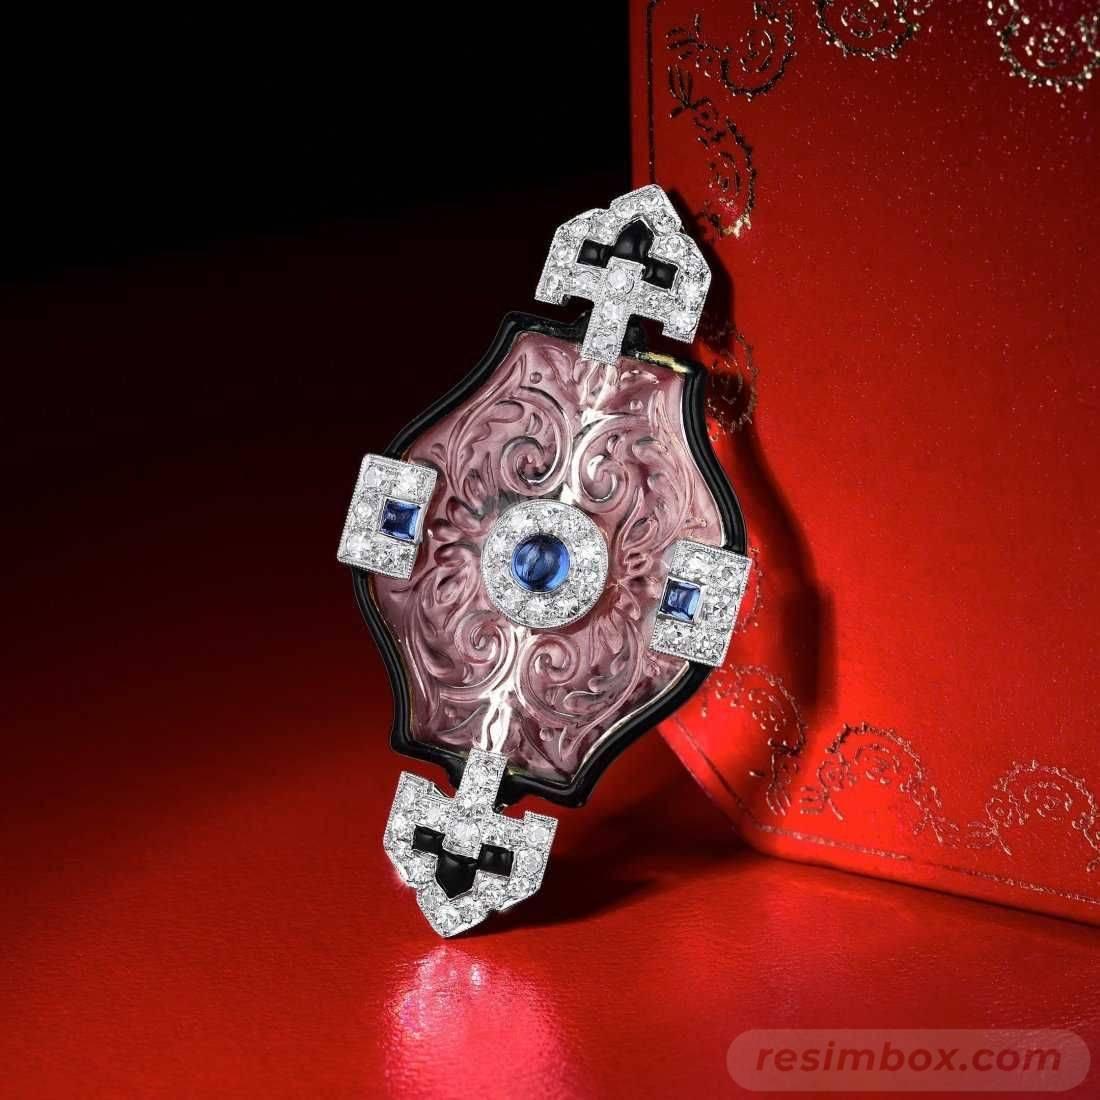 Art deco jewelry-167477679879870184